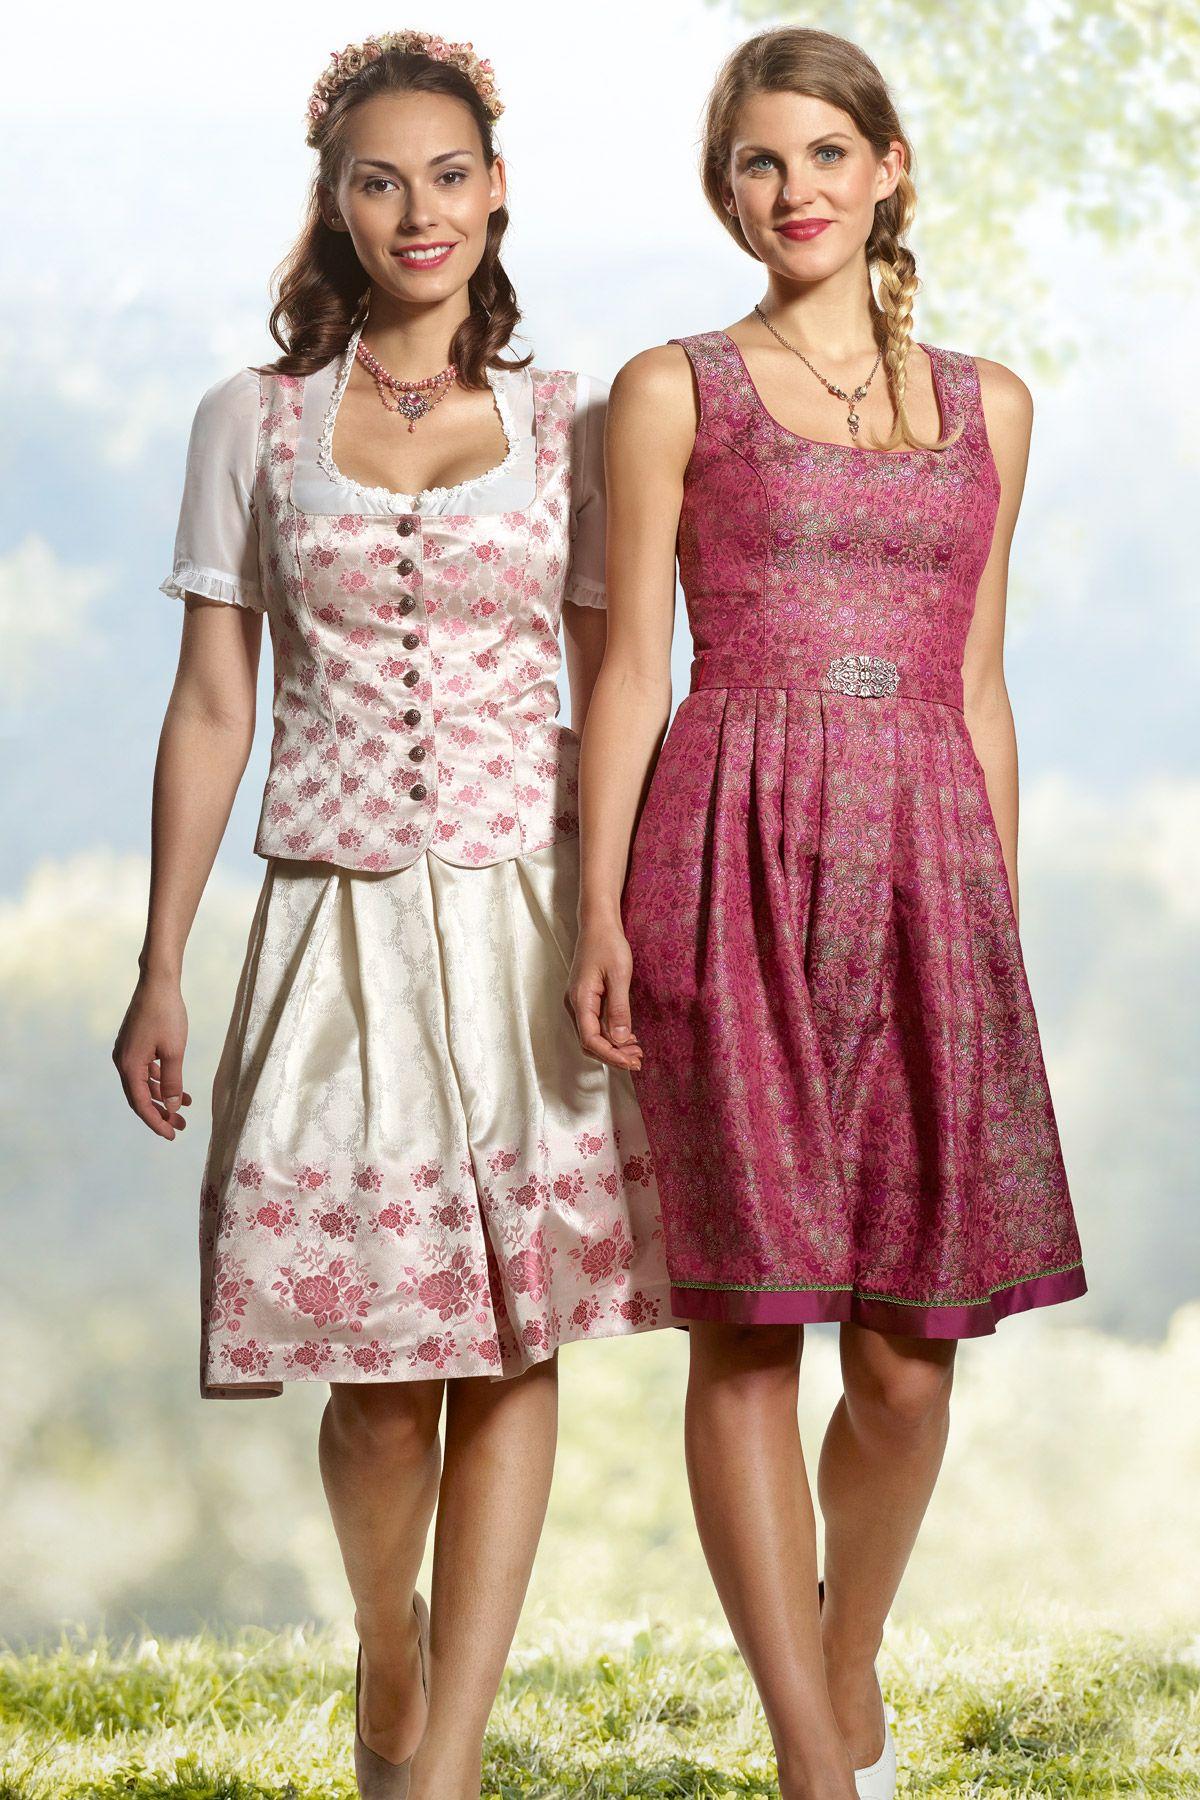 hiebaum trachtenrock corsage trachtenkleid weiss rosa rot. Black Bedroom Furniture Sets. Home Design Ideas